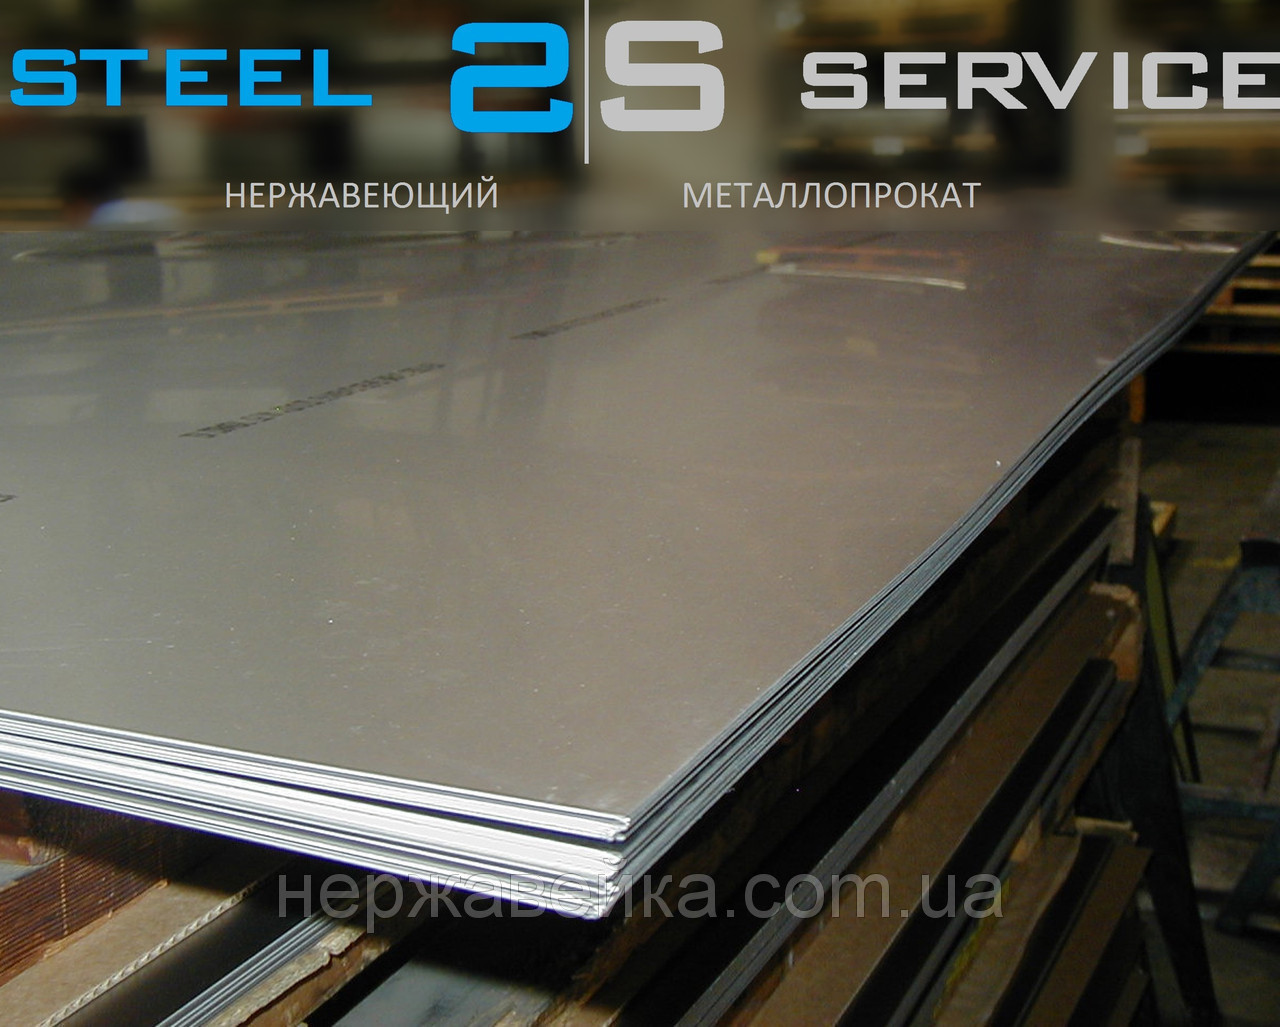 Нержавеющий лист 1,5х1500х3000мм AISI 430(12Х17) 2B - матовый, технический